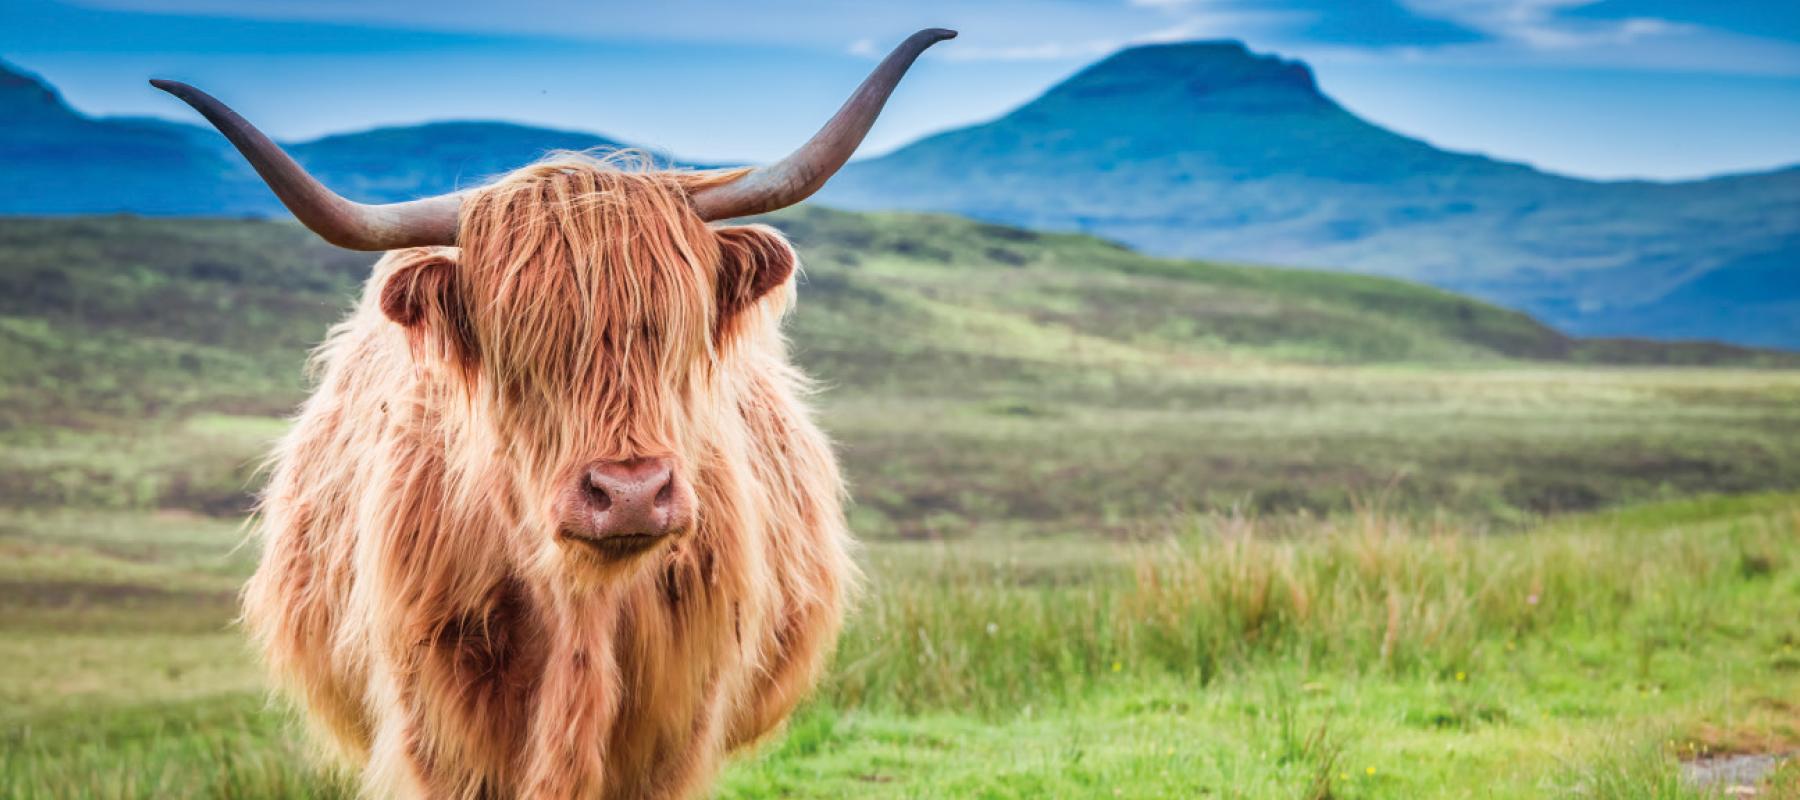 Spirit van de maand januari 2021: The Highland Bull